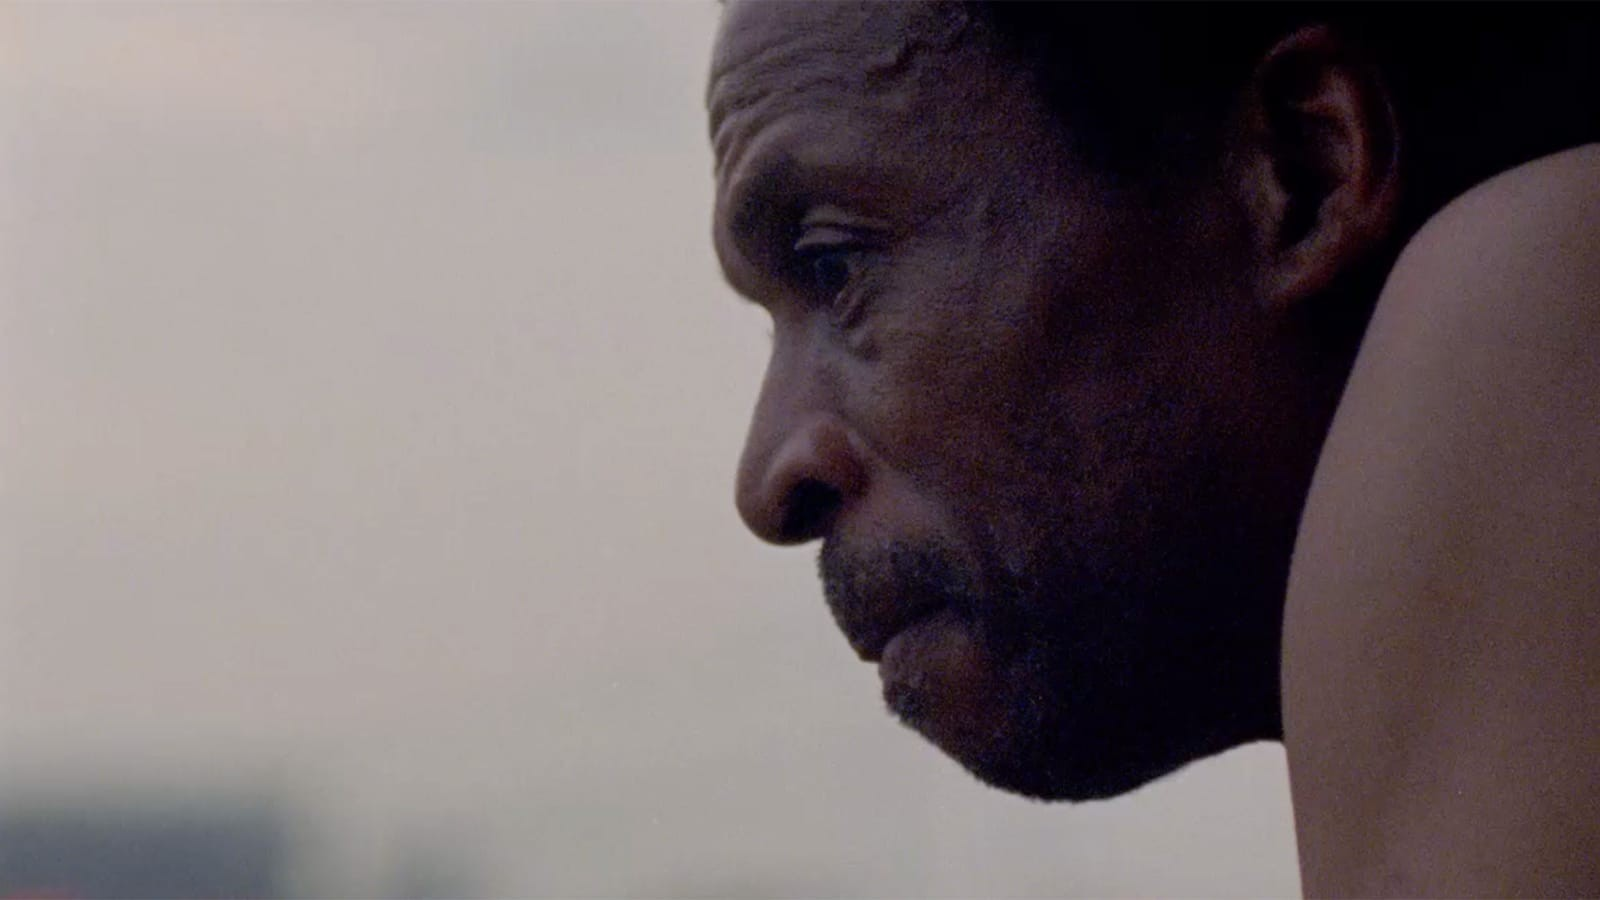 A close-up of a dark-skinned man in profile.